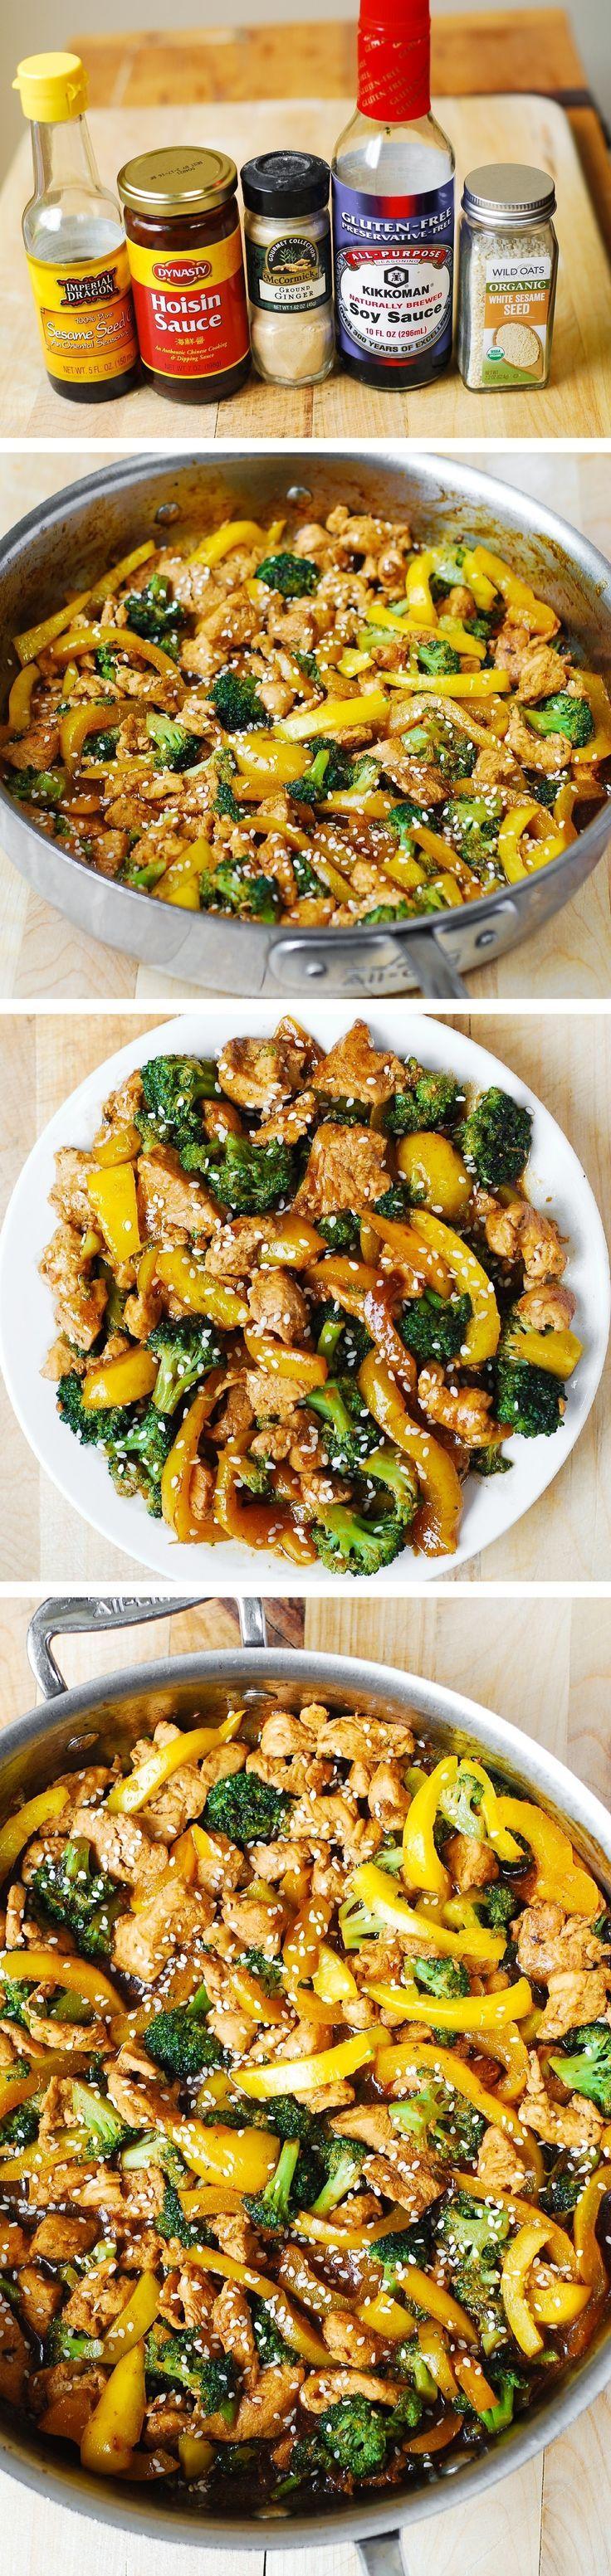 Chicken, Broccoli, and Yellow Bell Pepper Stir Fry #stirfry #chicken #vegetables